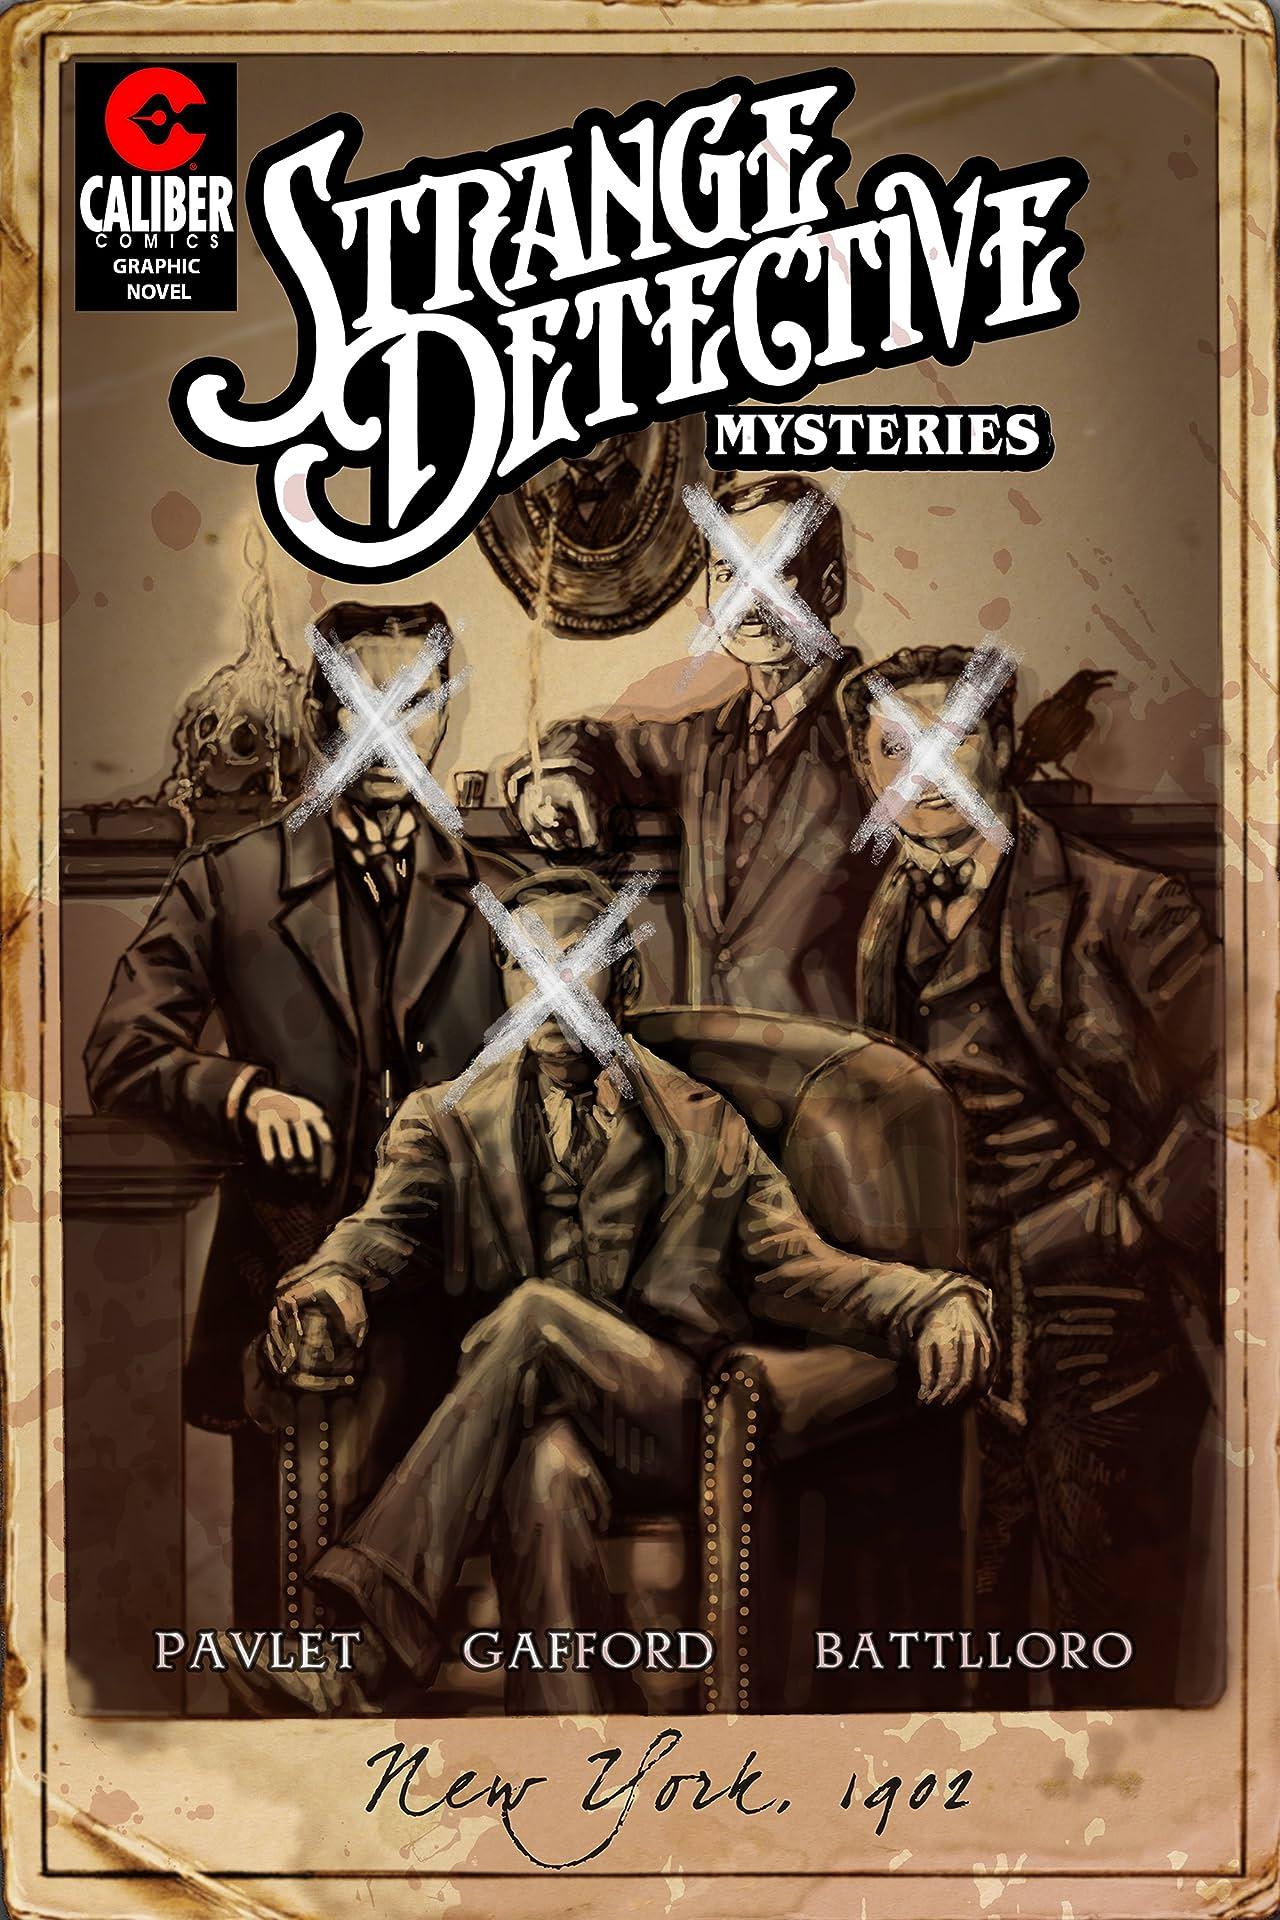 Strange Detective Mysteries